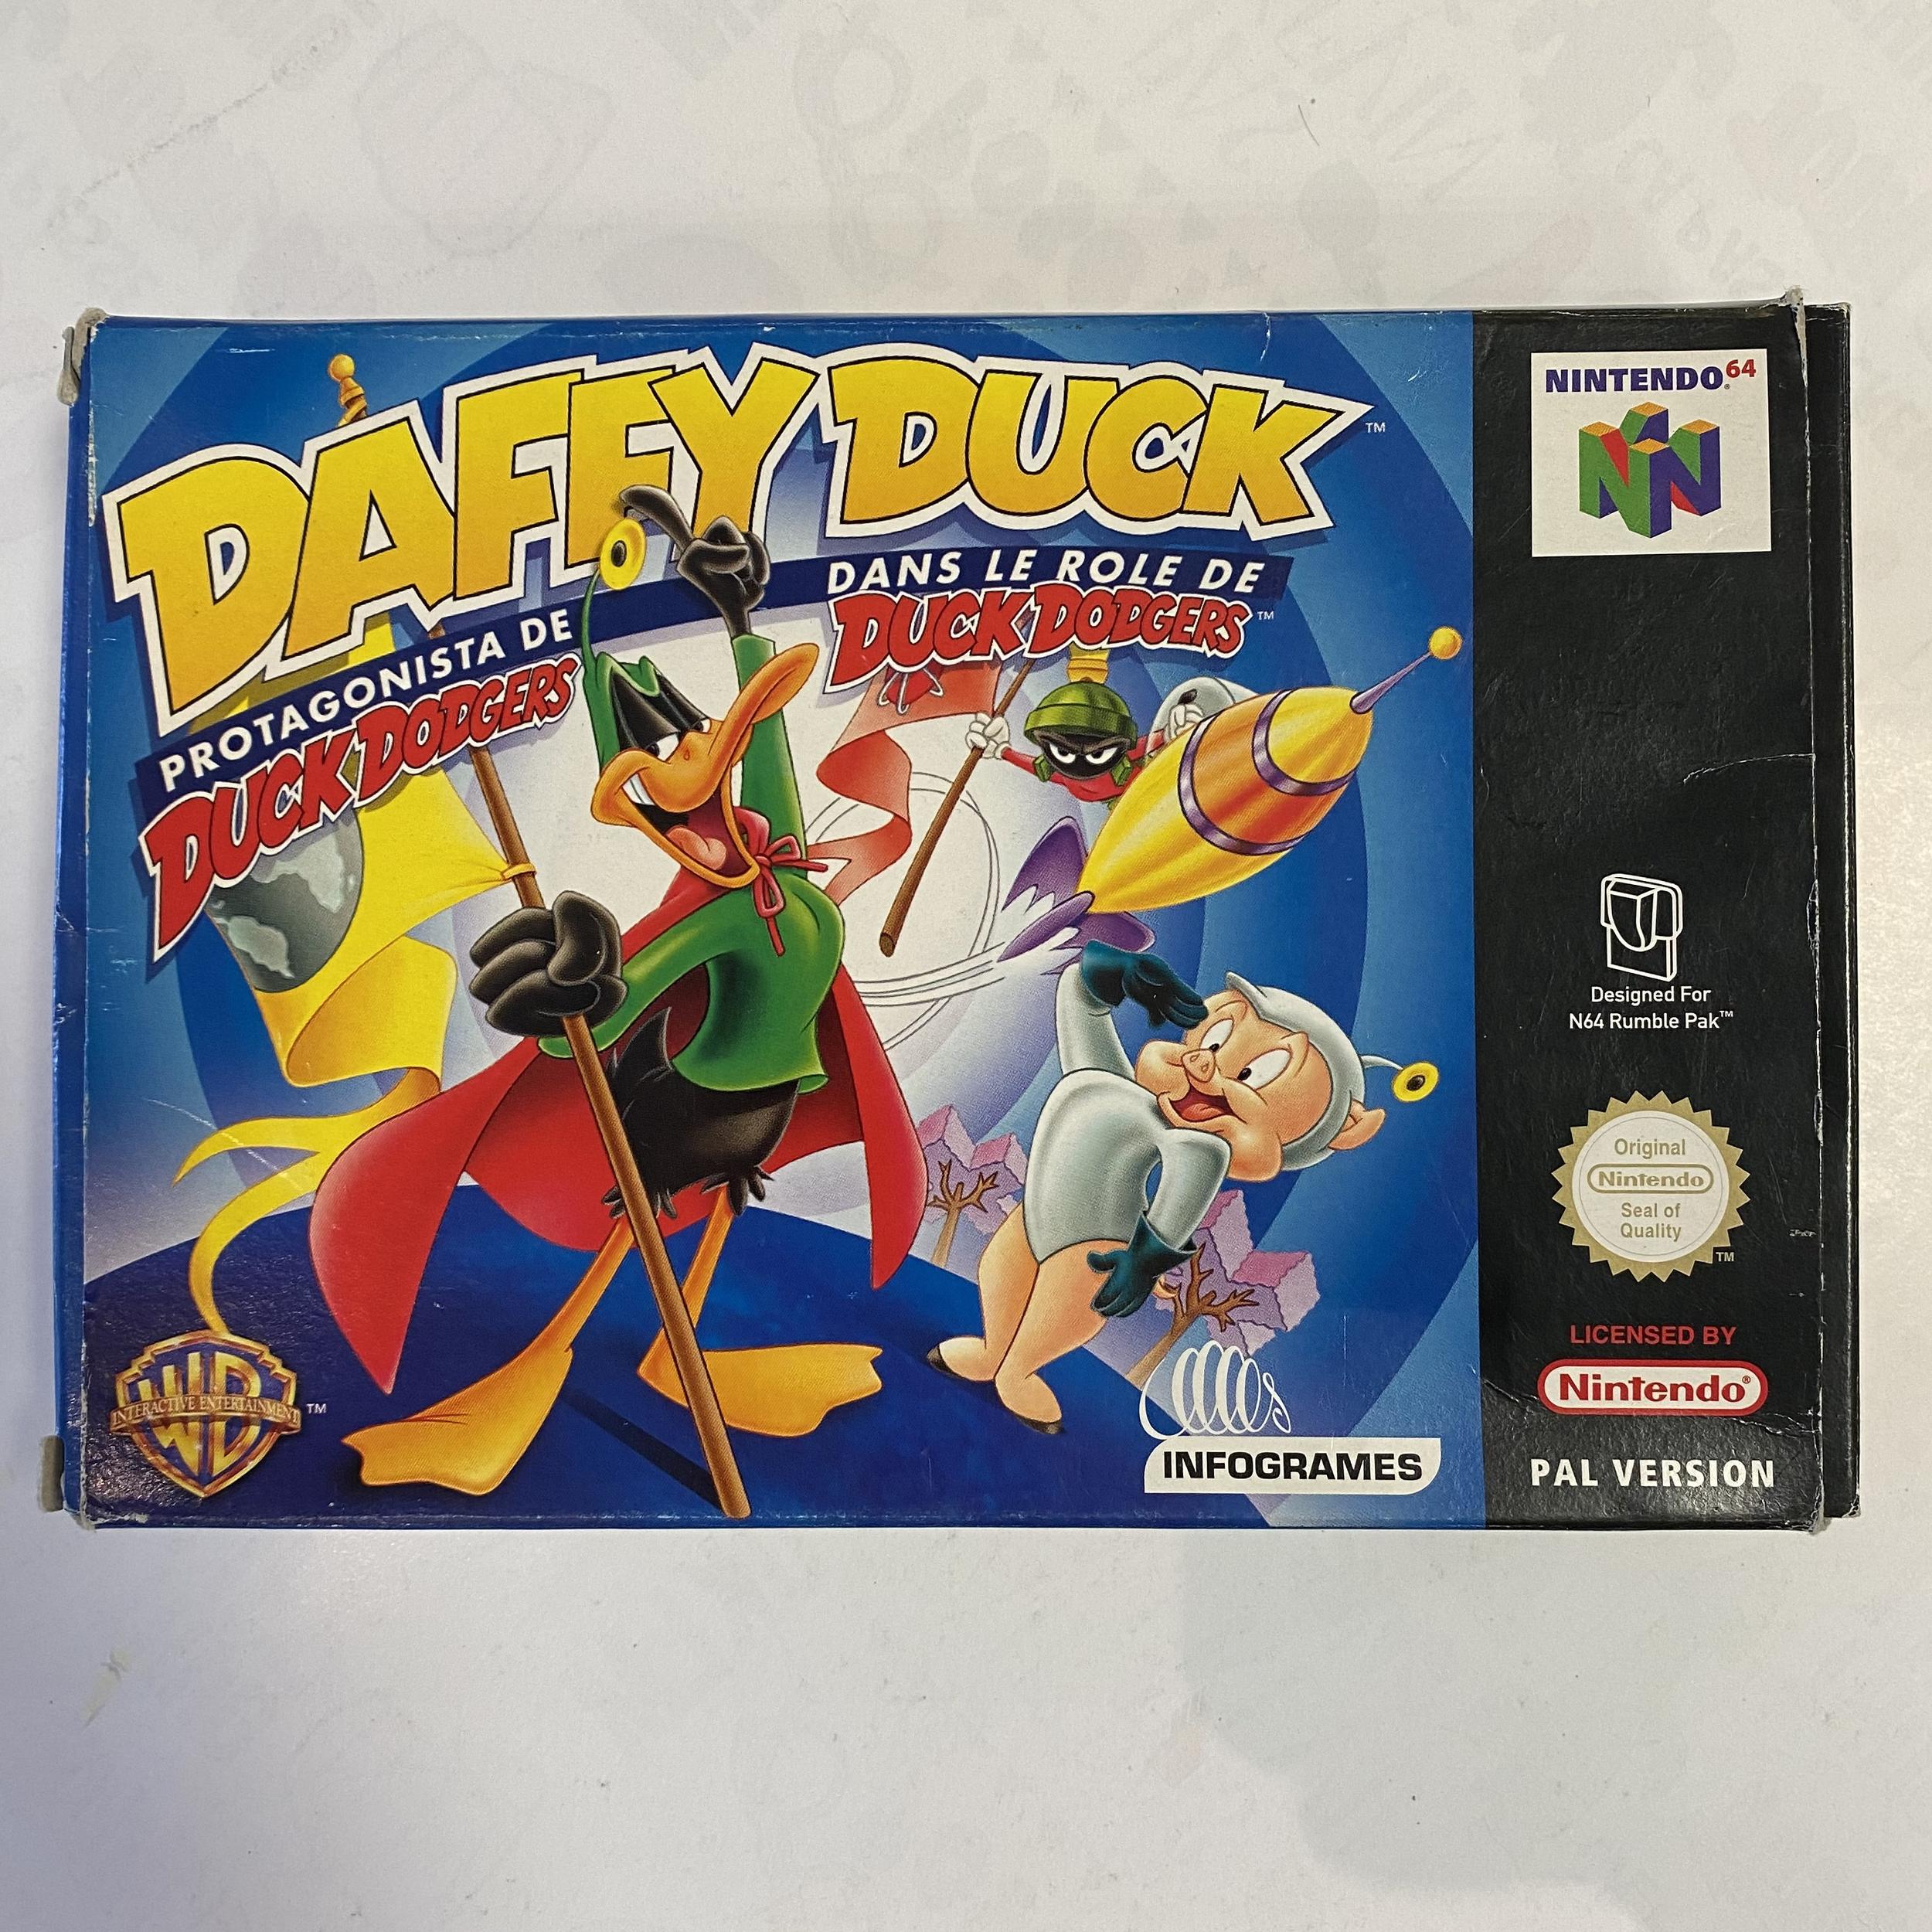 Nintendo 64 - Daffy Duck occasion